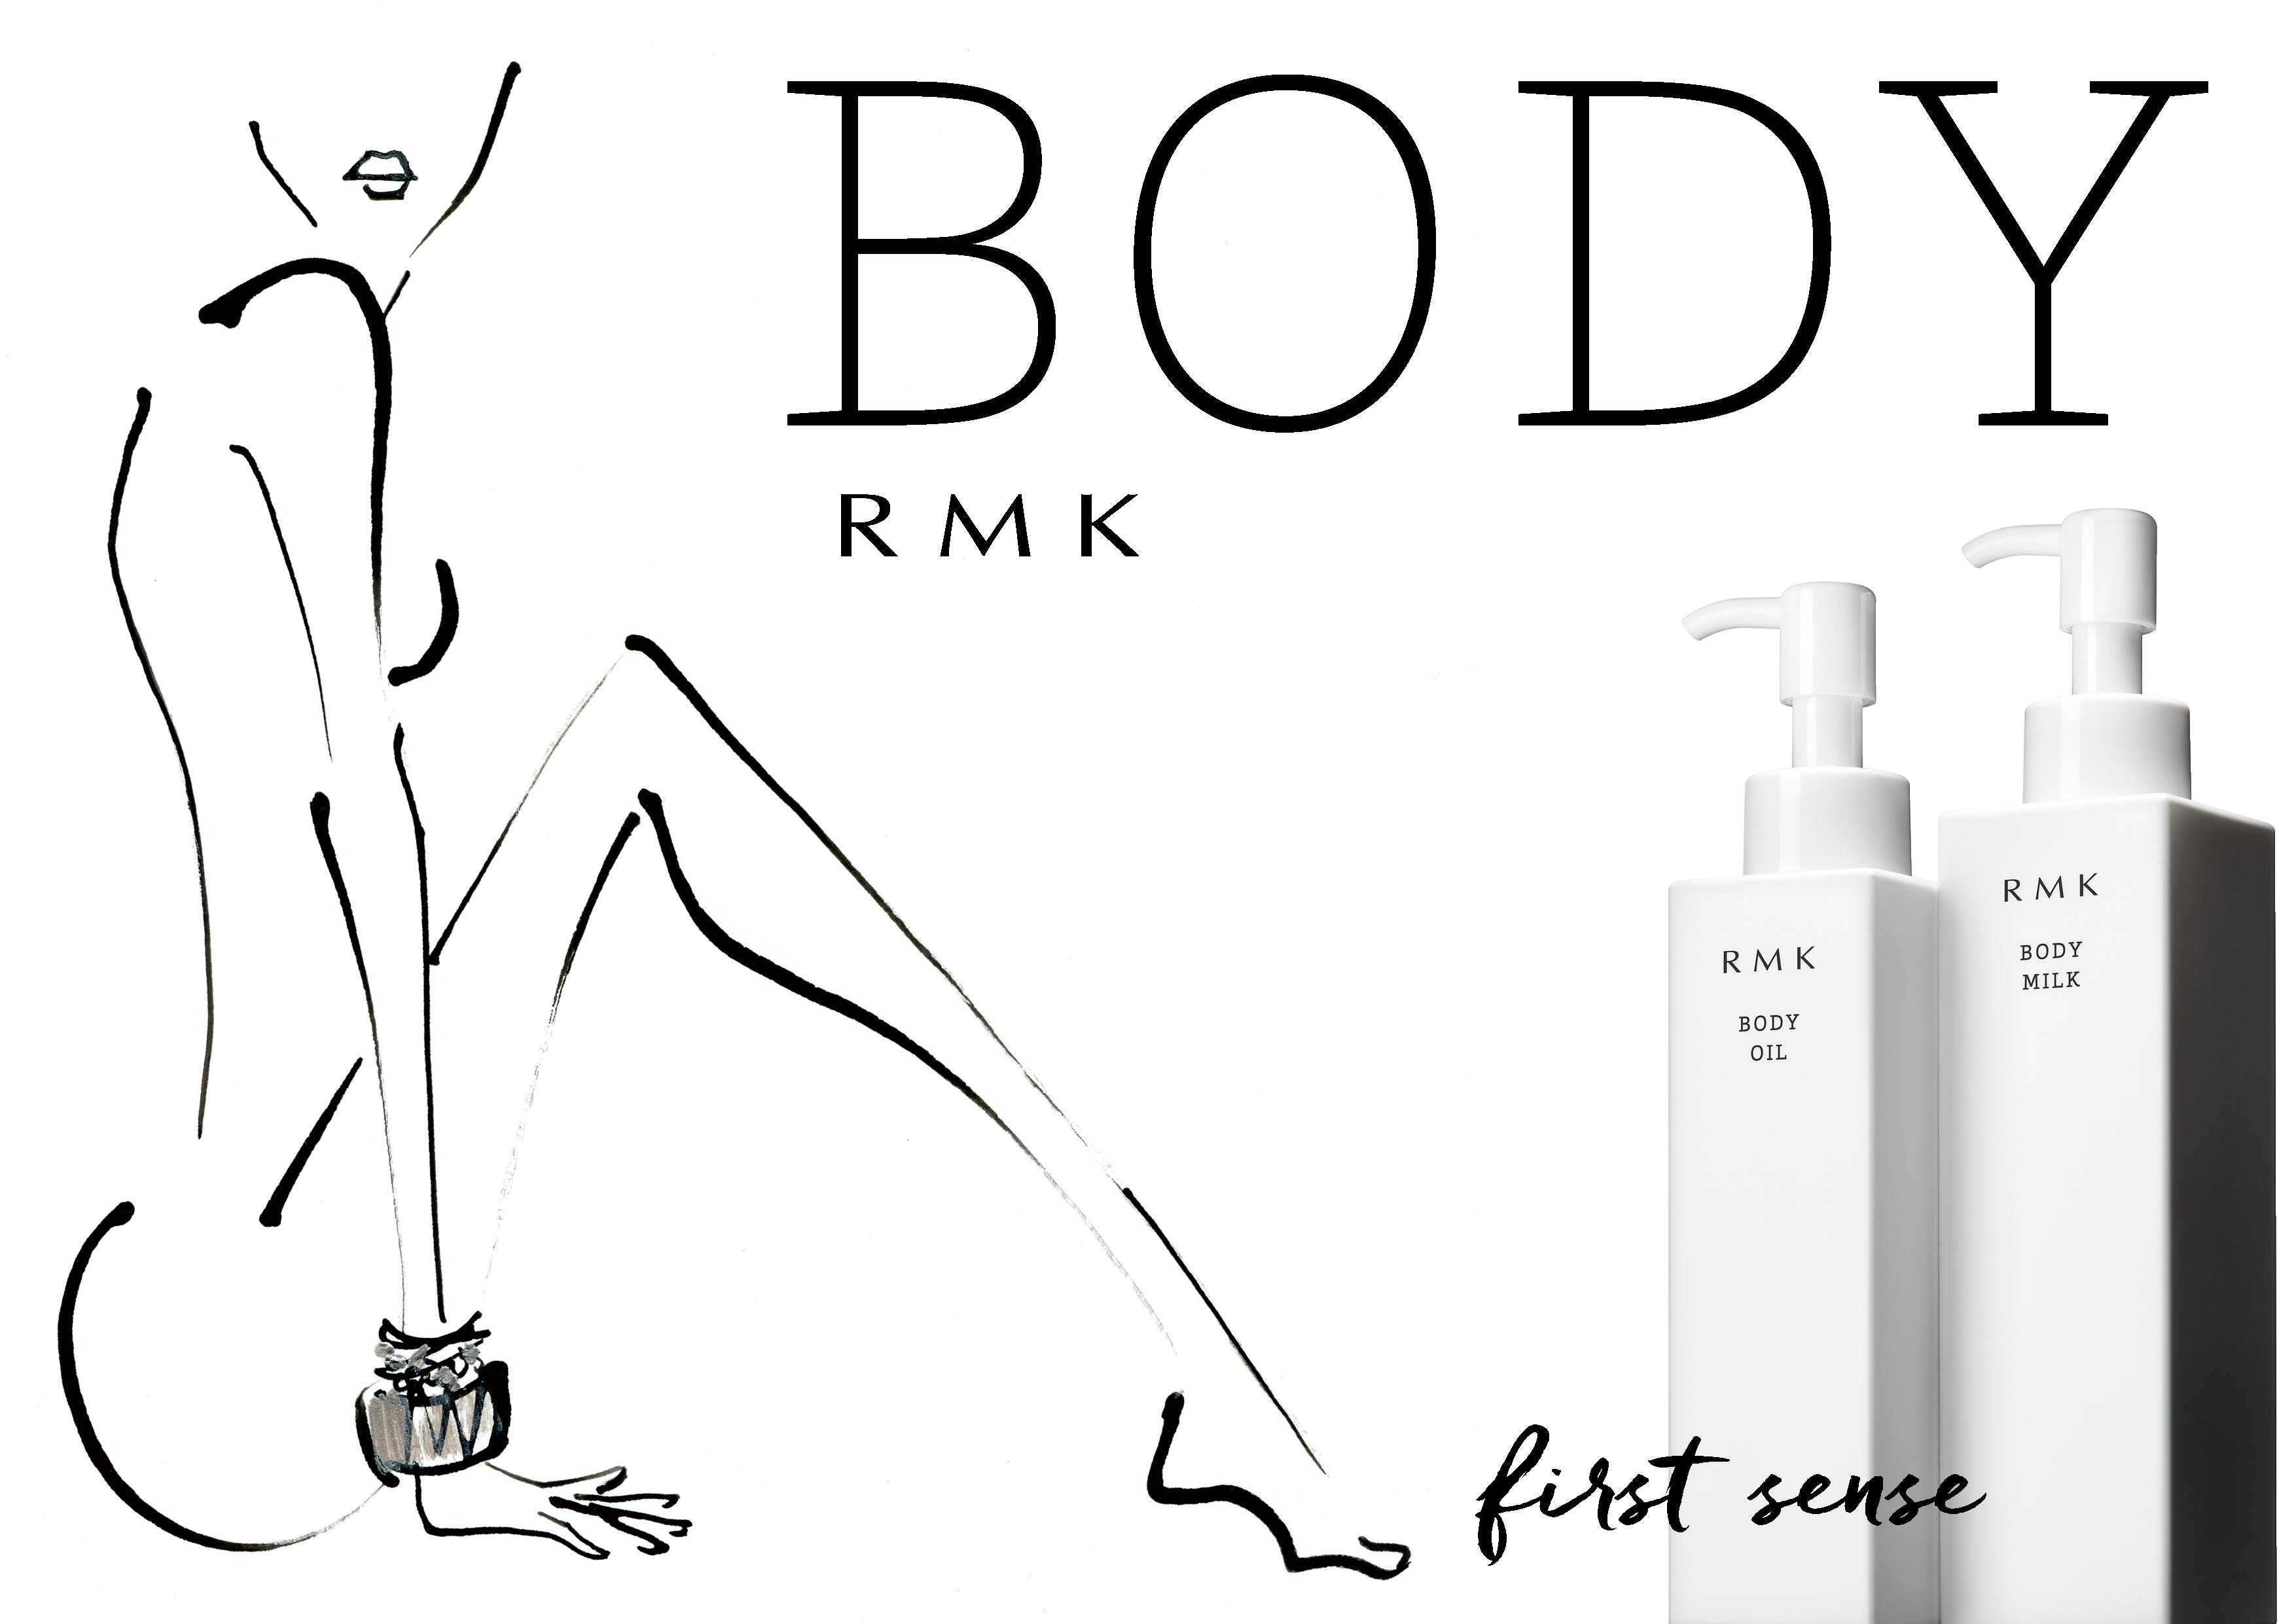 RMK 2015 「First Sense」身體保養 開啟感官知覺之旅